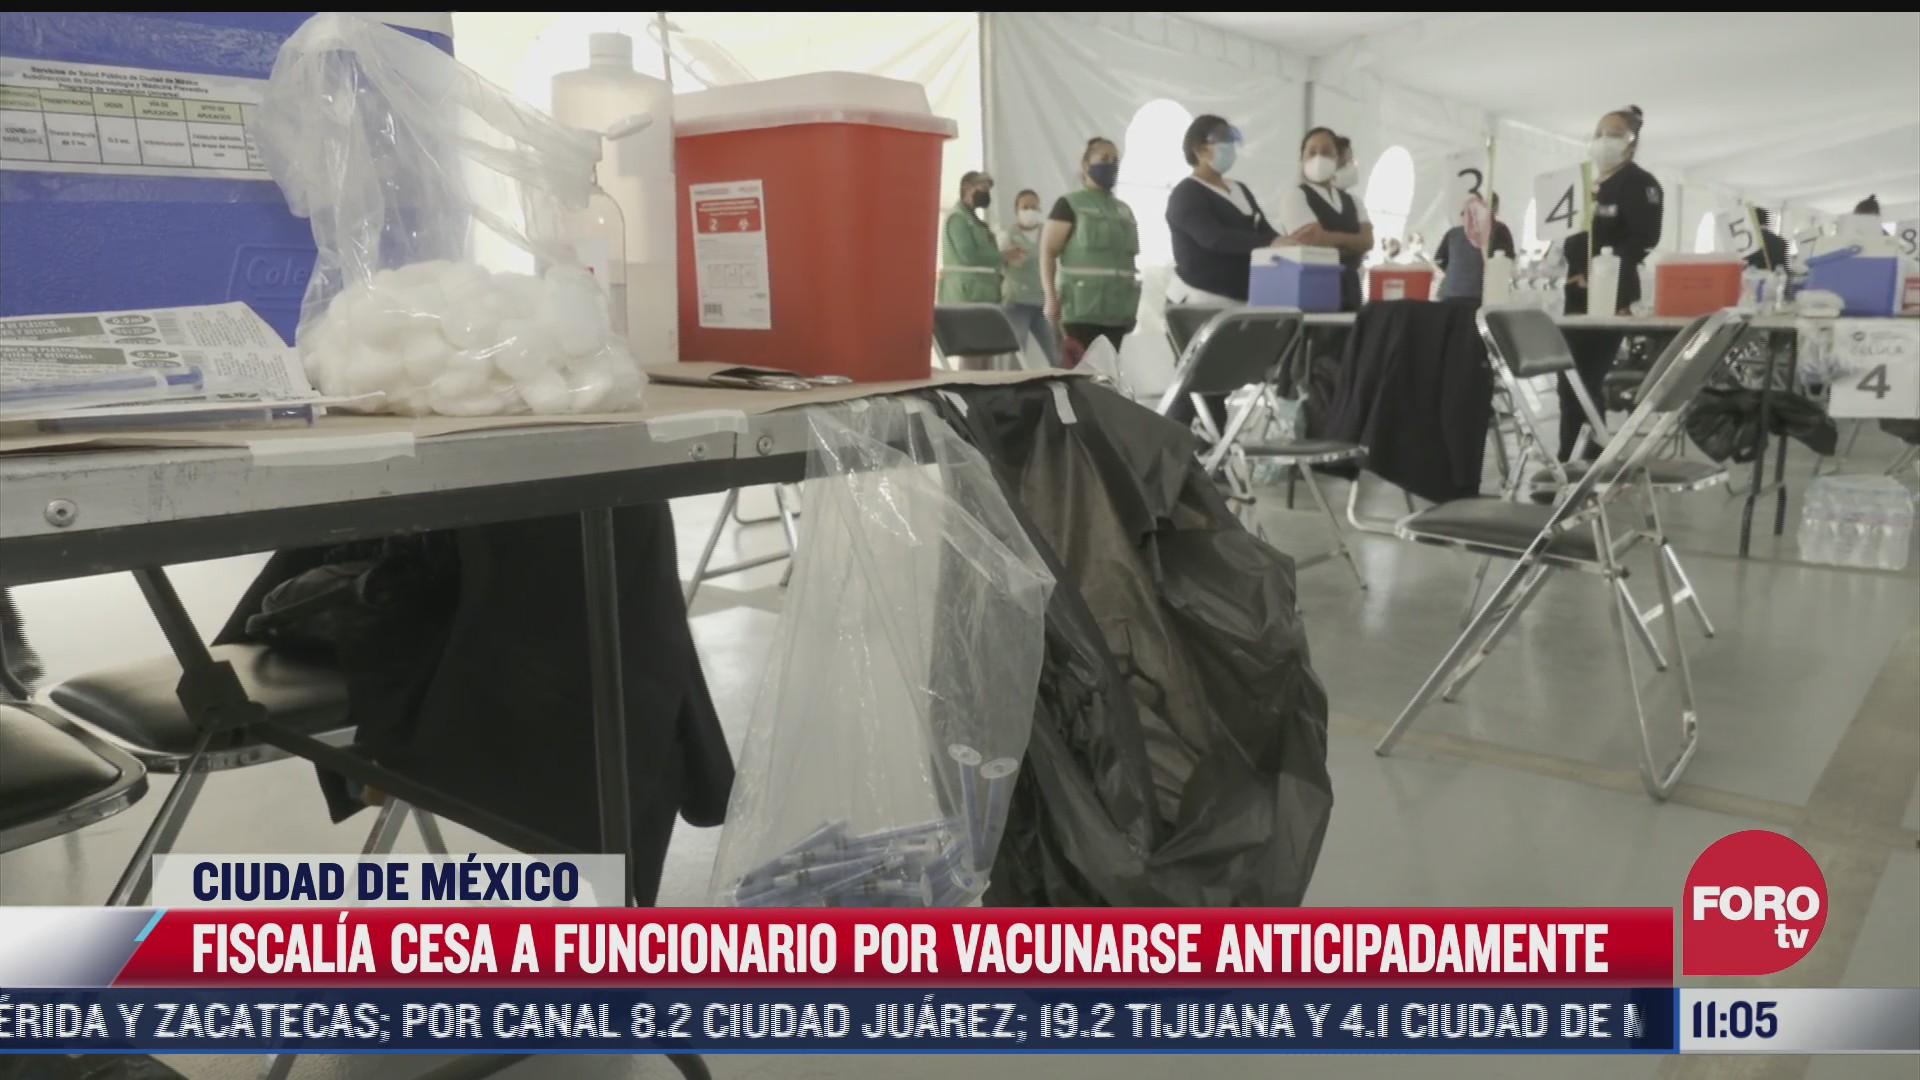 fiscalia de cdmx cesa a funcionario por vacunarse anticipadamente